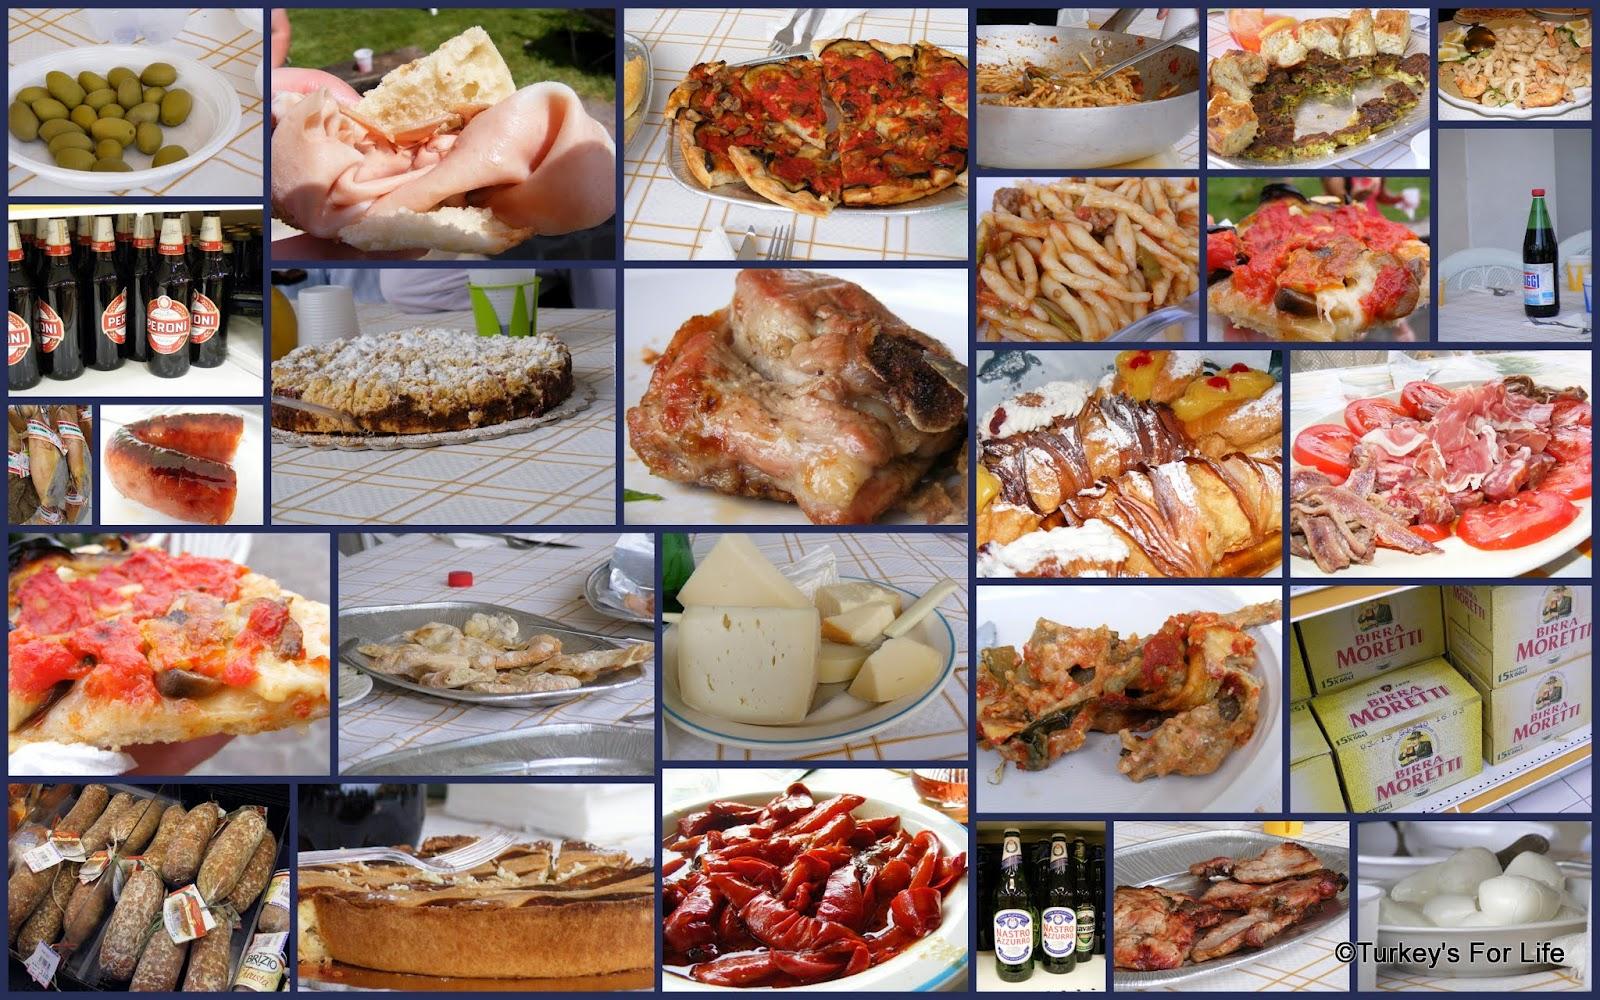 Just lots of Italian goodness!